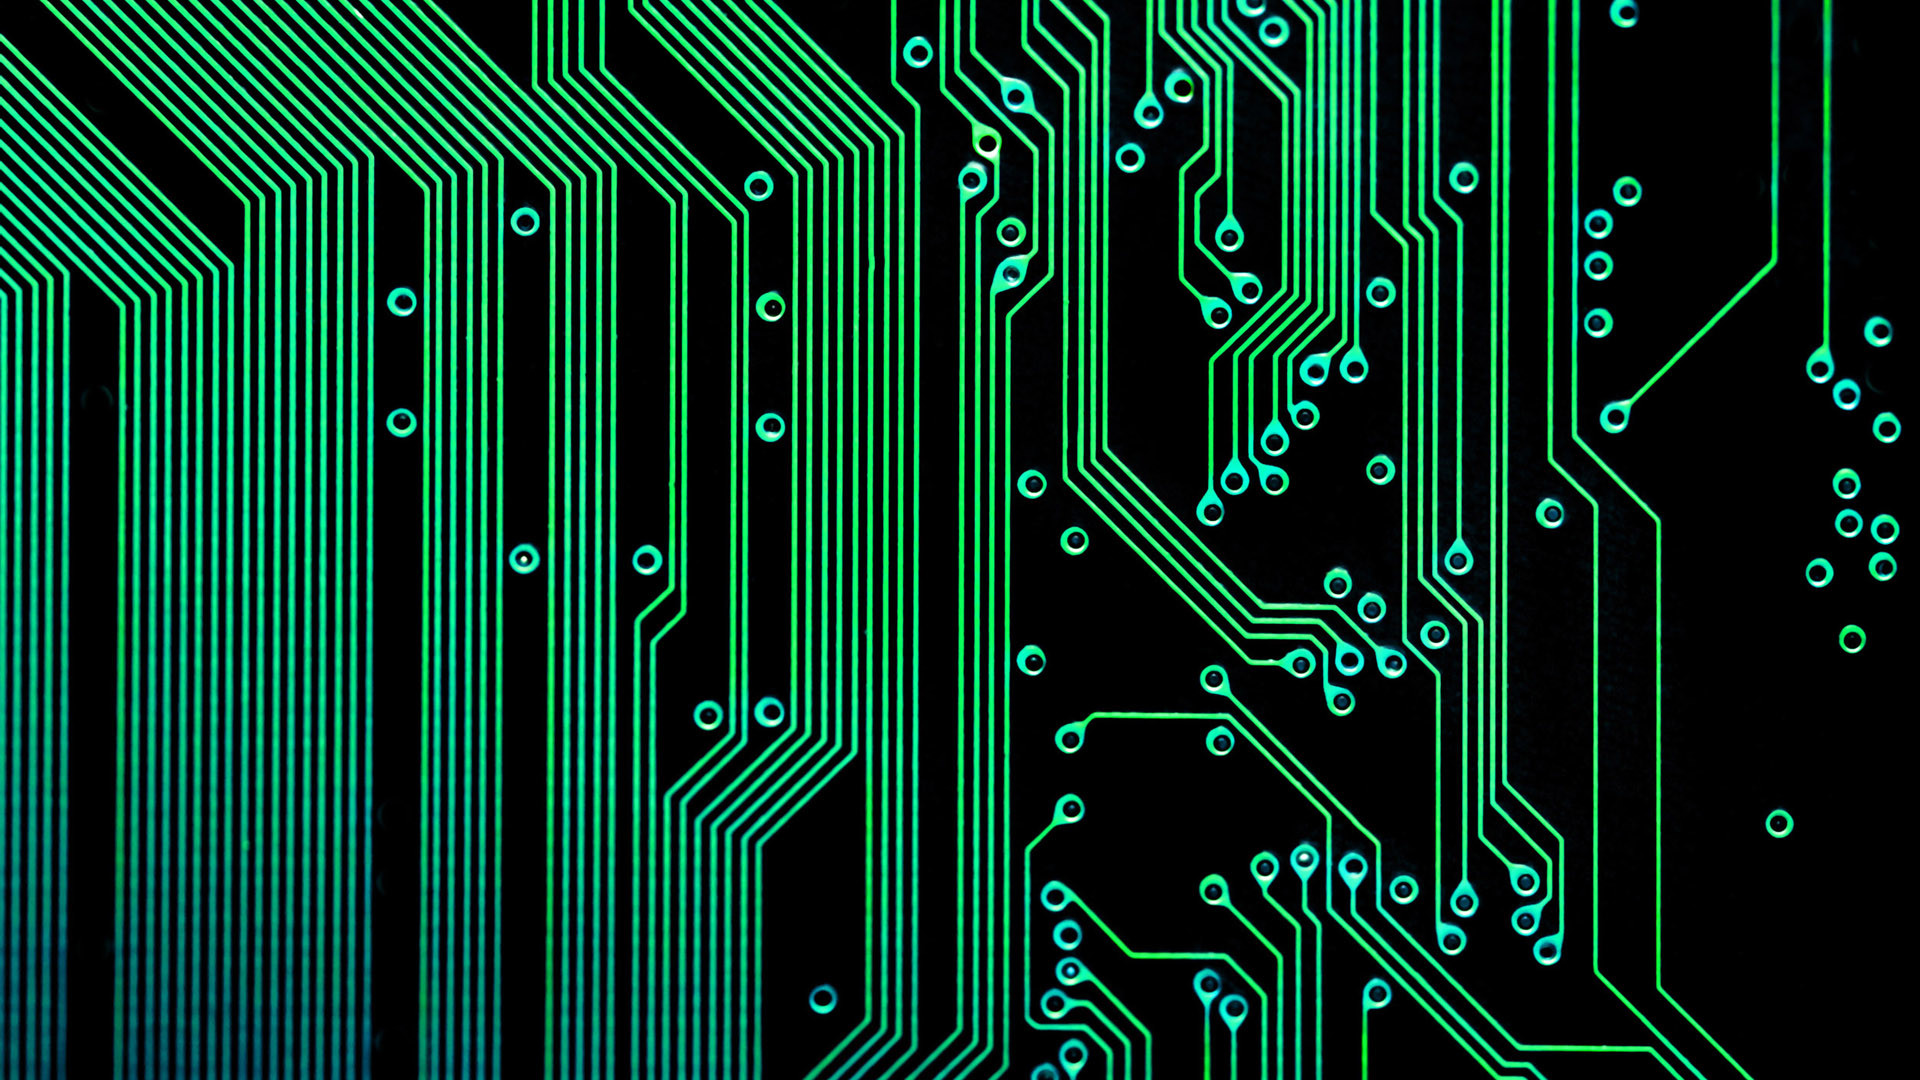 Circuit Board Wallpapers Full Hd Wallpaper Search